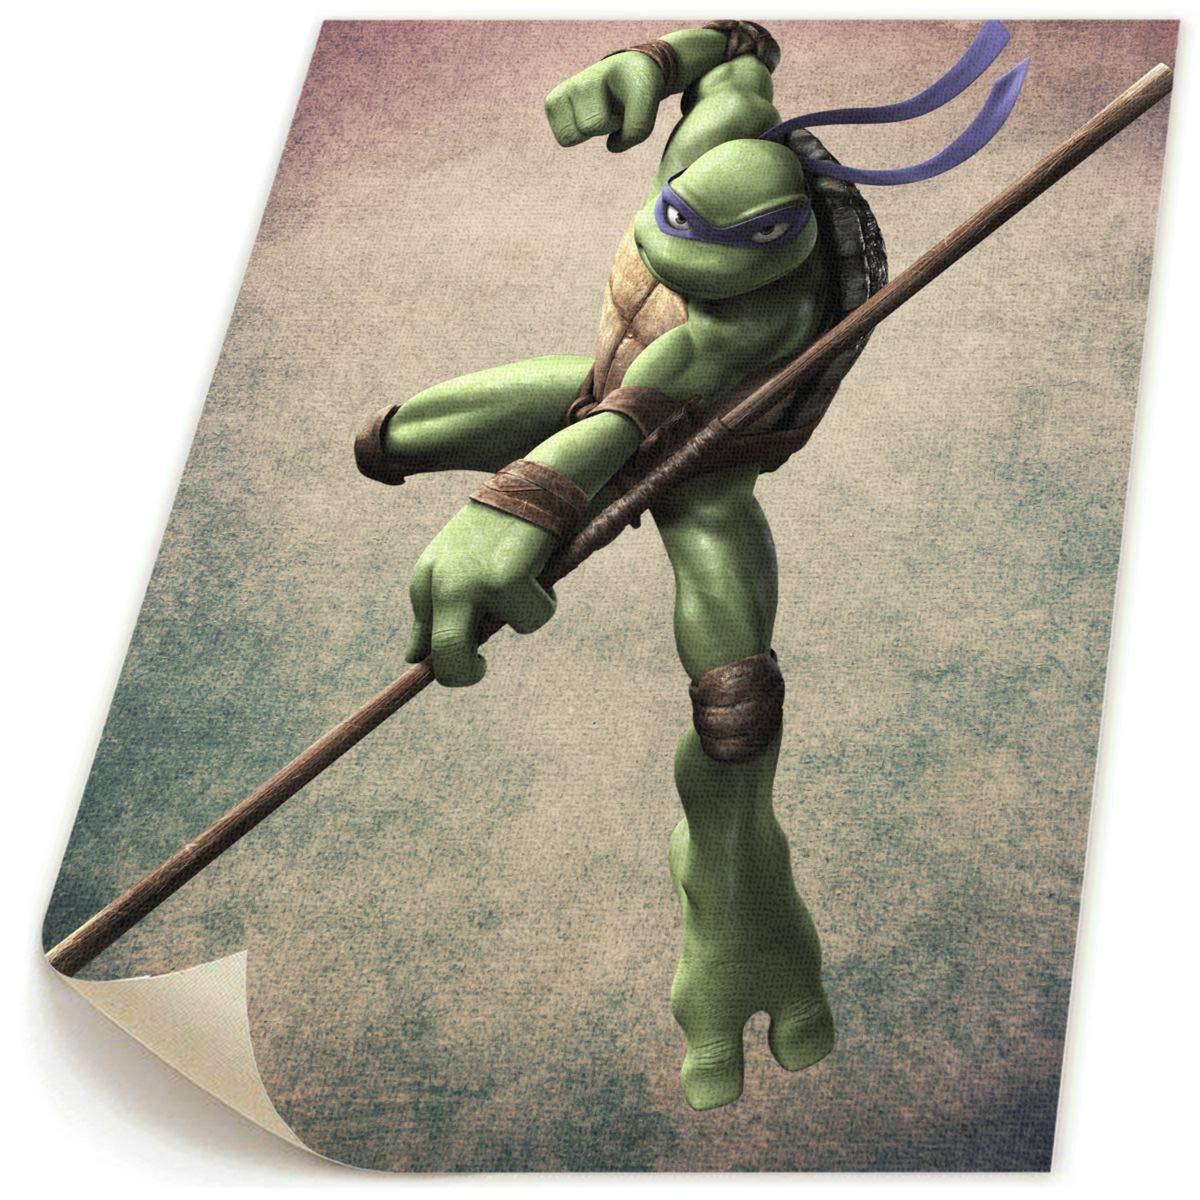 Amazon.com: HotHZ Ninja Turtle Artwork Wall Pictures Canvas ...